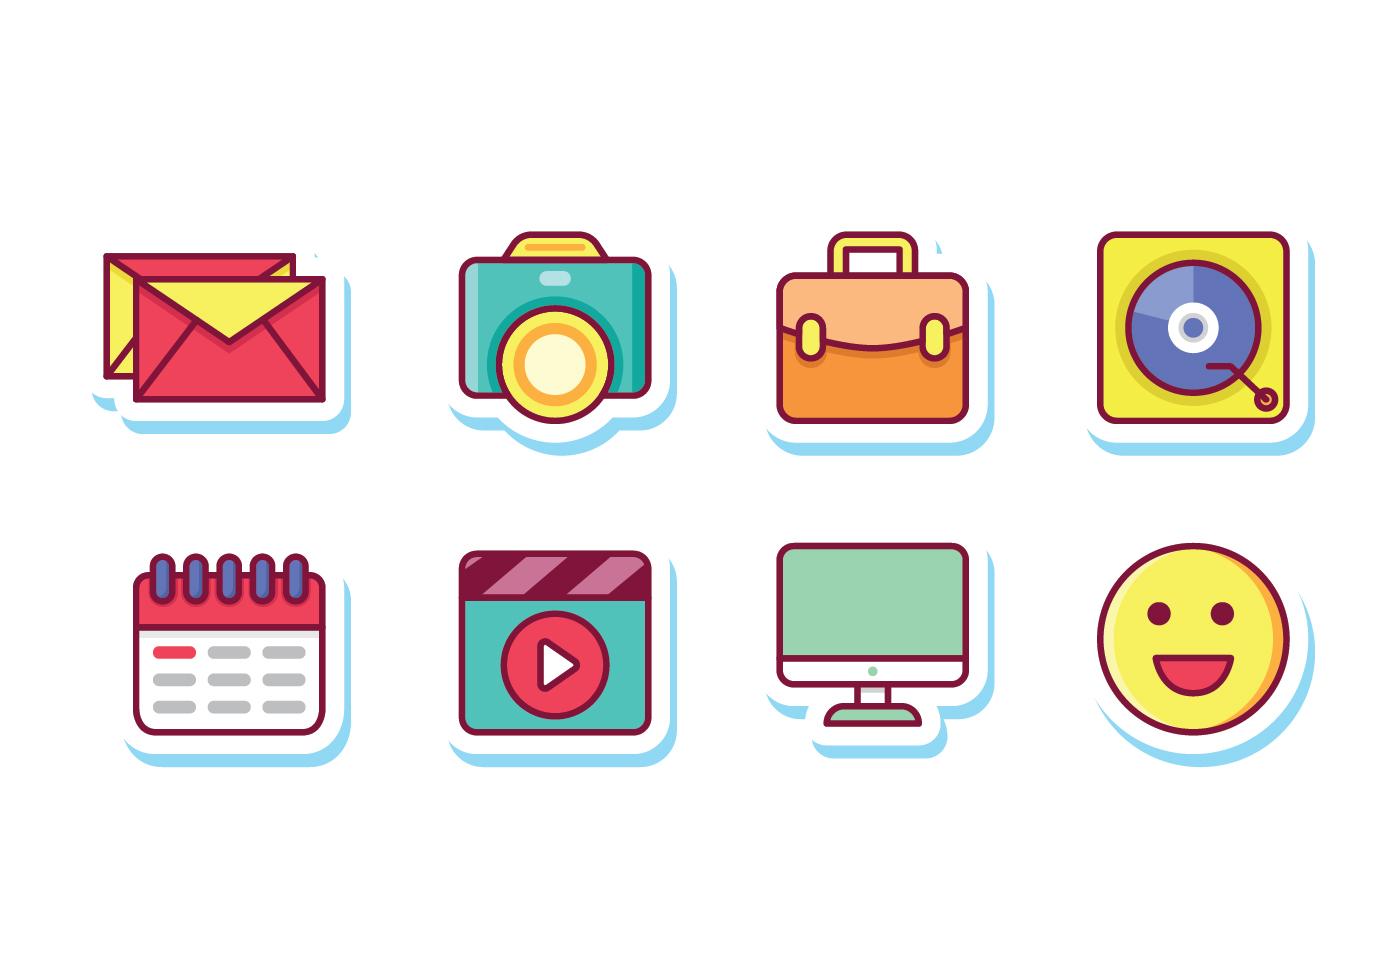 Social Media Sticker Icons - Download Free Vector Art ...